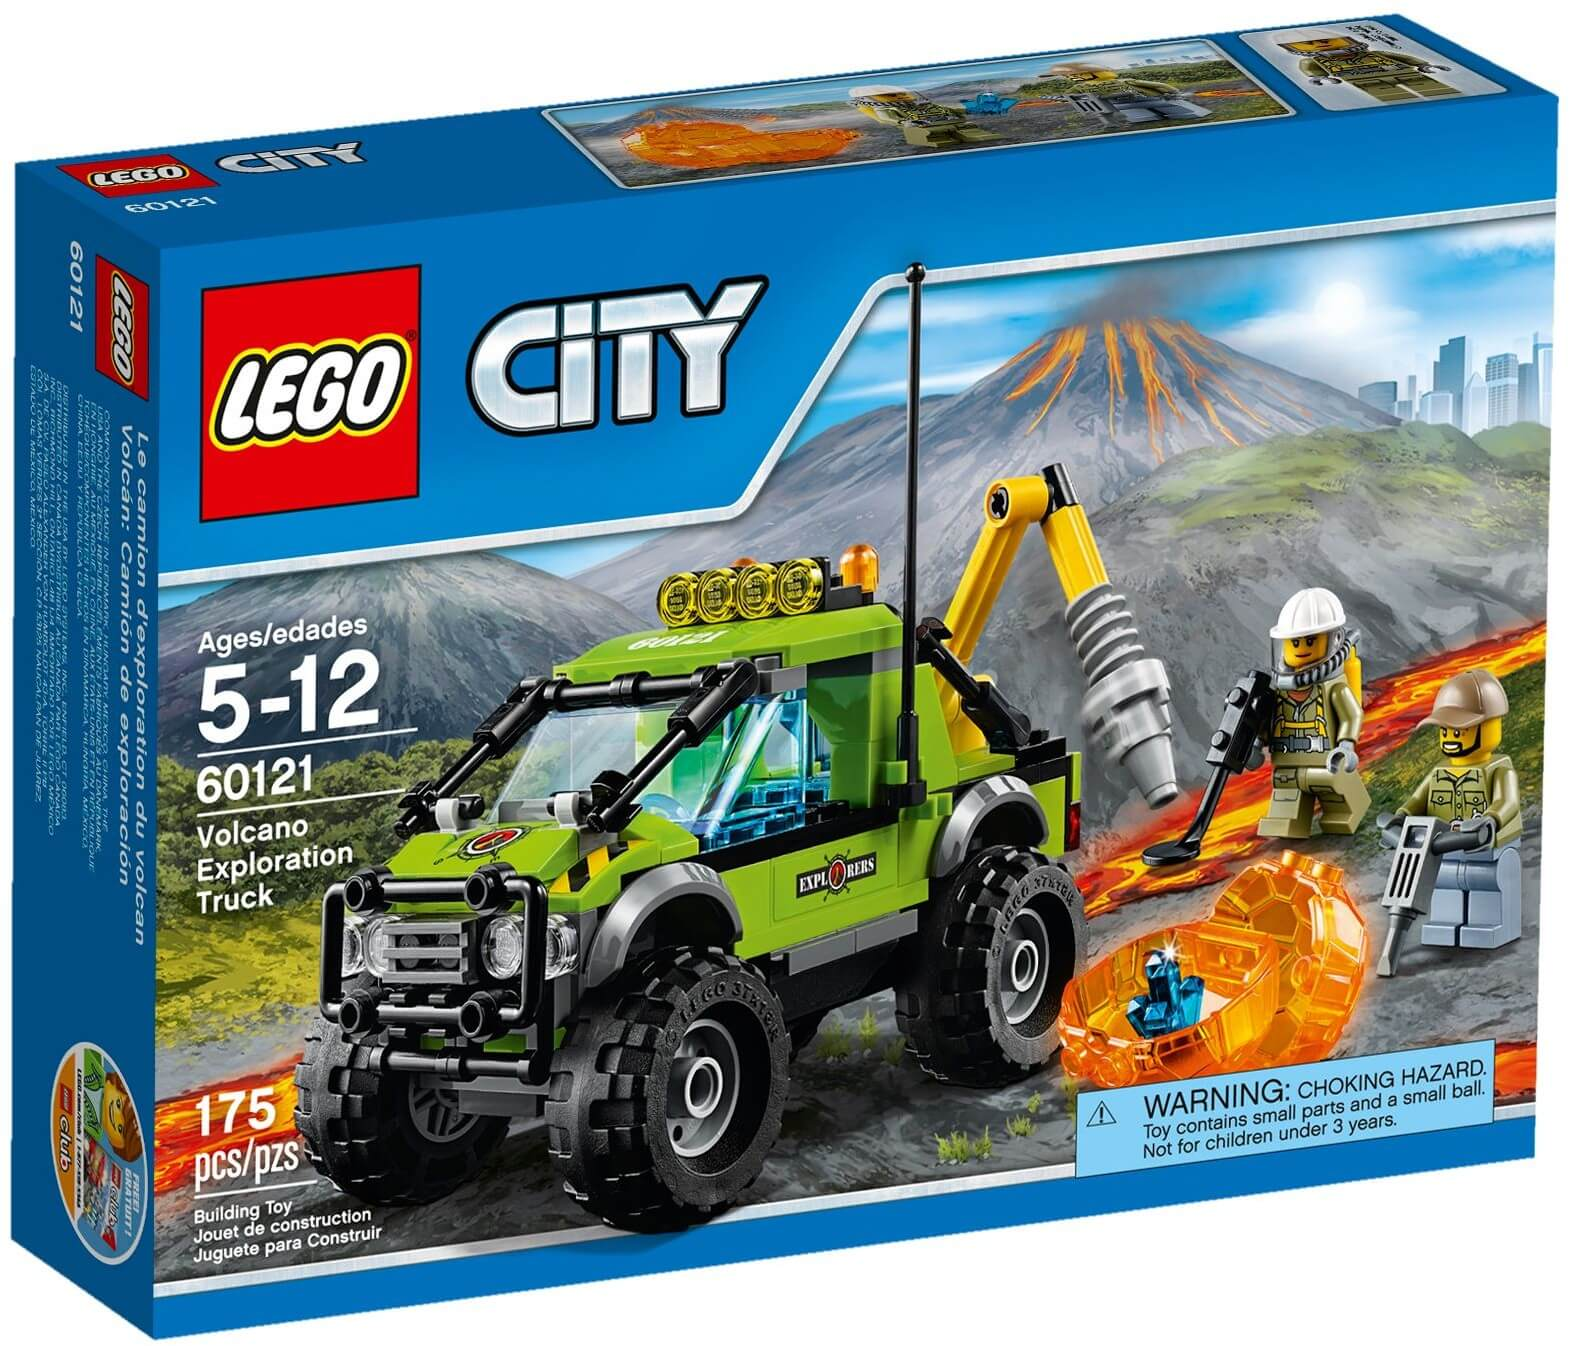 Mua đồ chơi LEGO 60121 - LEGO City 60121 - Xe Tải thám hiểm Núi Lửa (LEGO City Volcano Exploration Truck 60121)